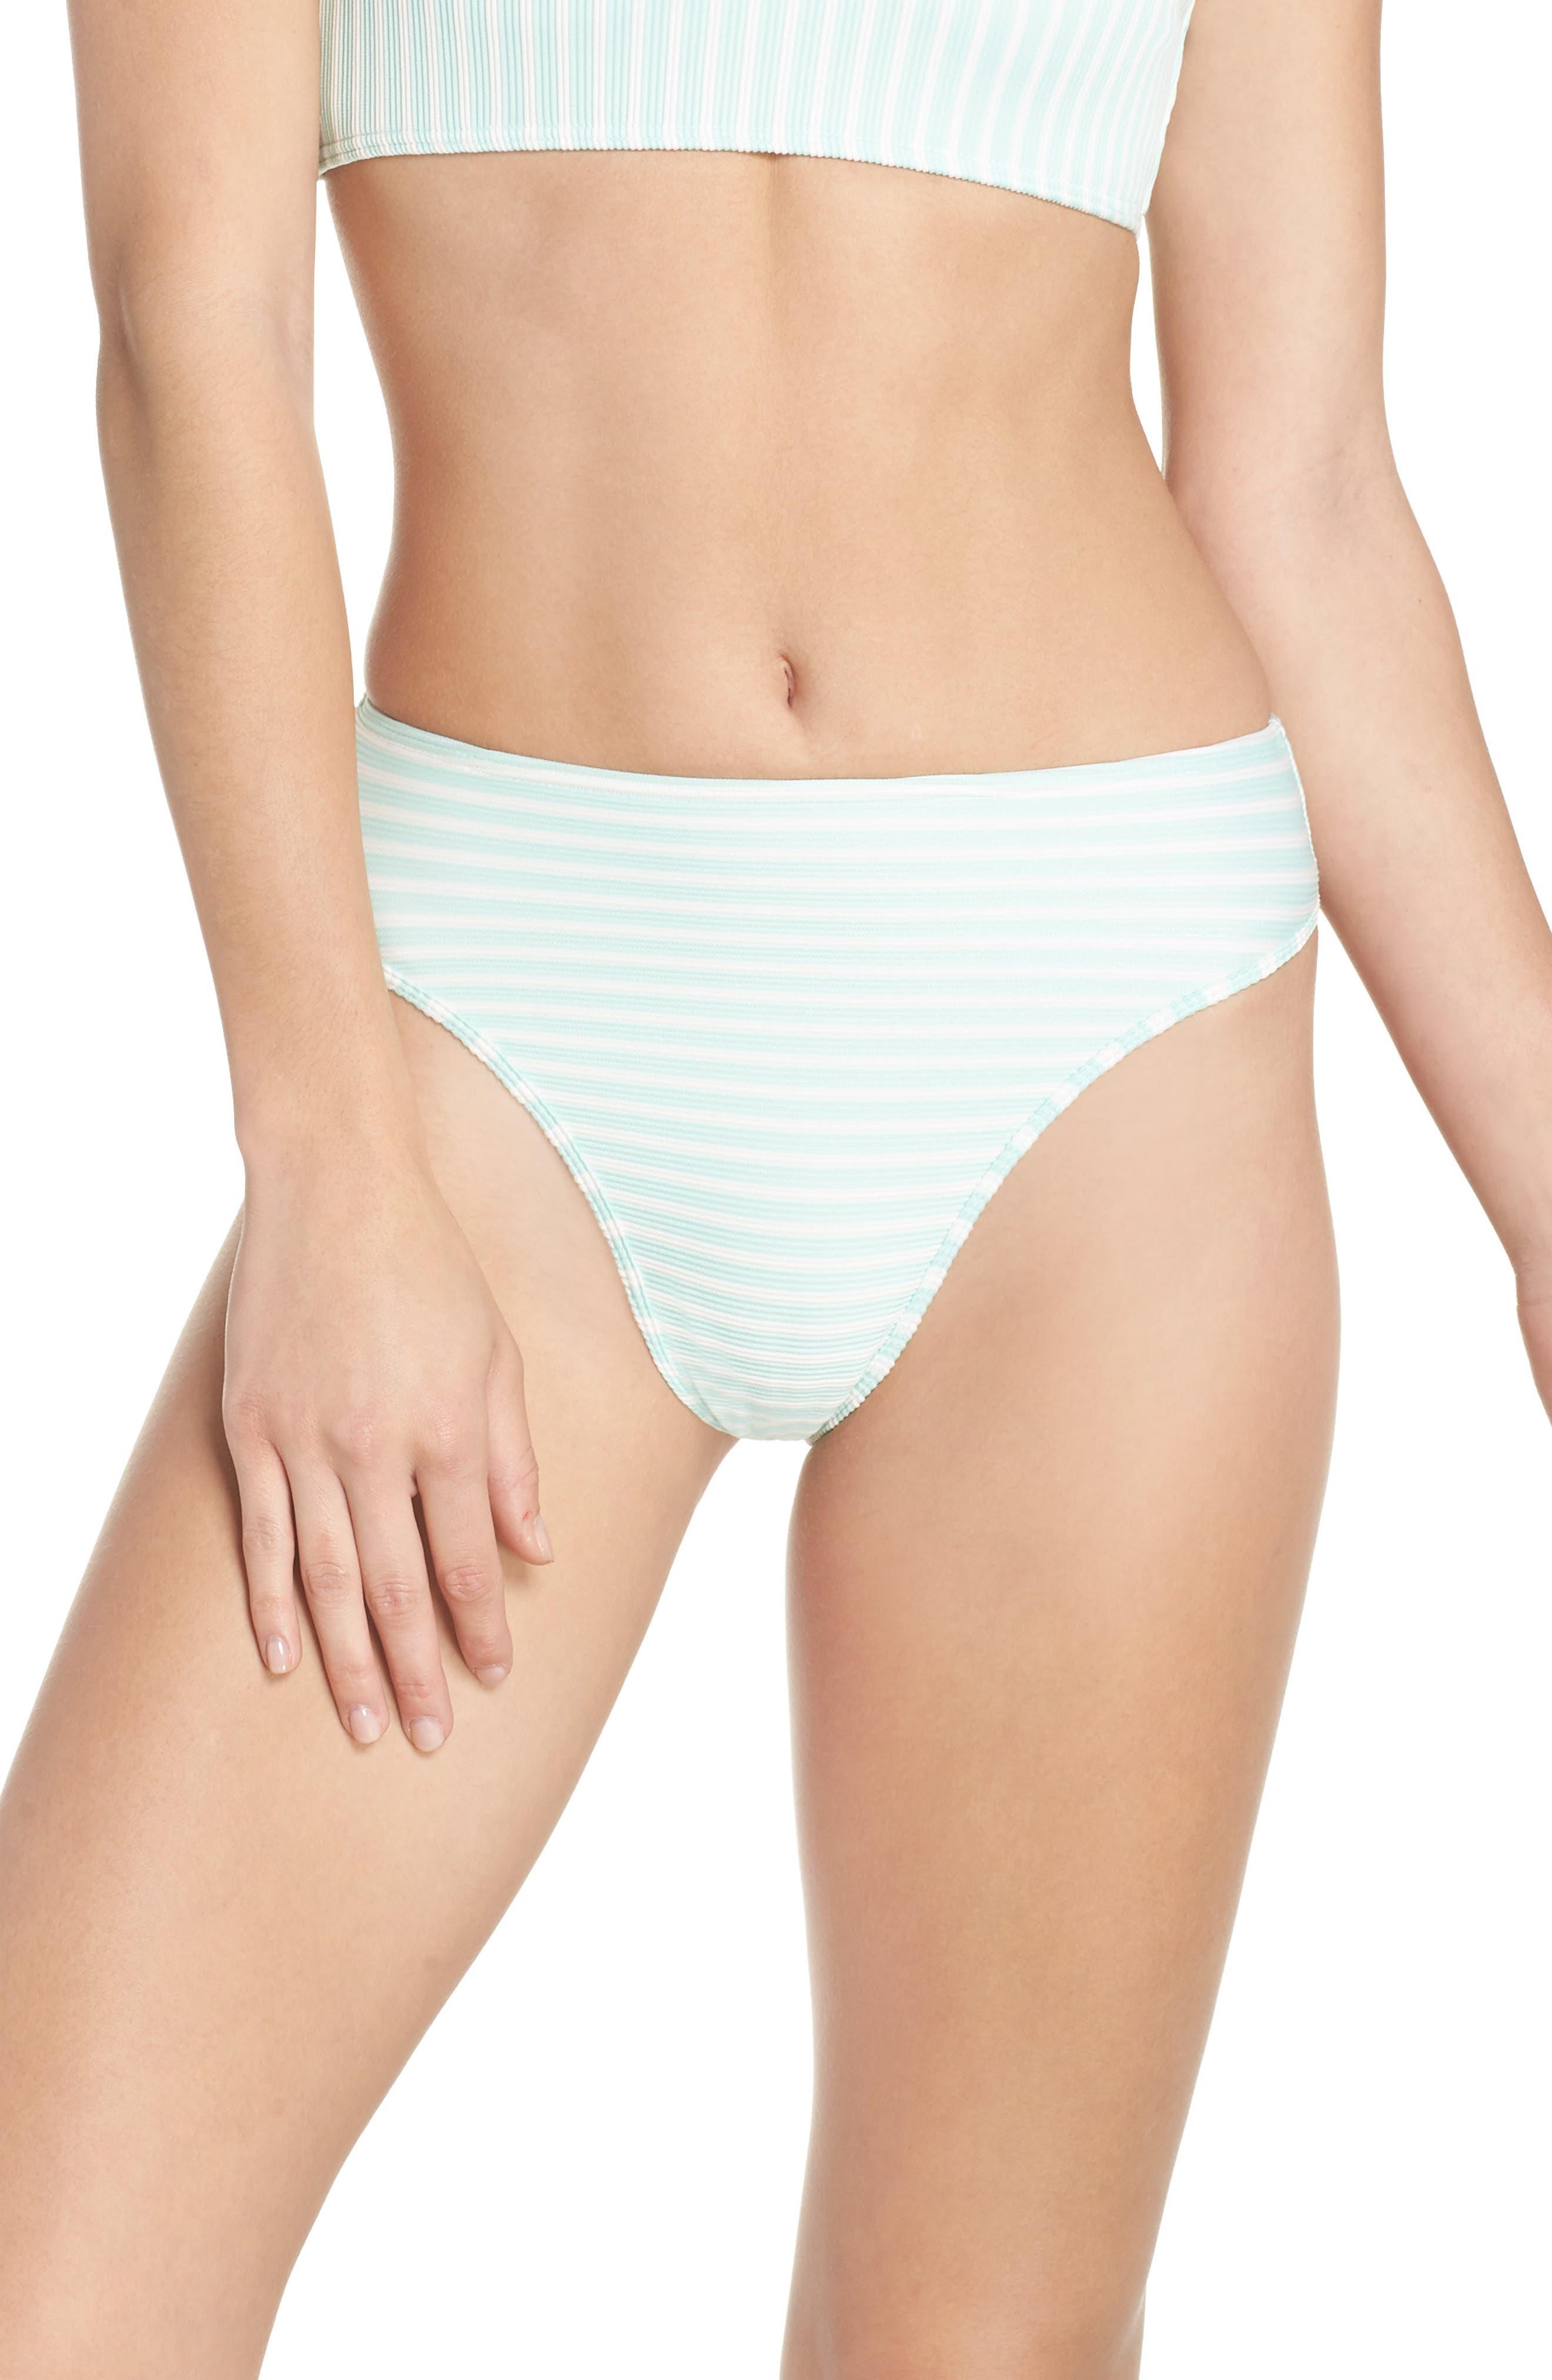 Pierre High Waist Bikini Bottoms,                         Main,                         color, Spearmint